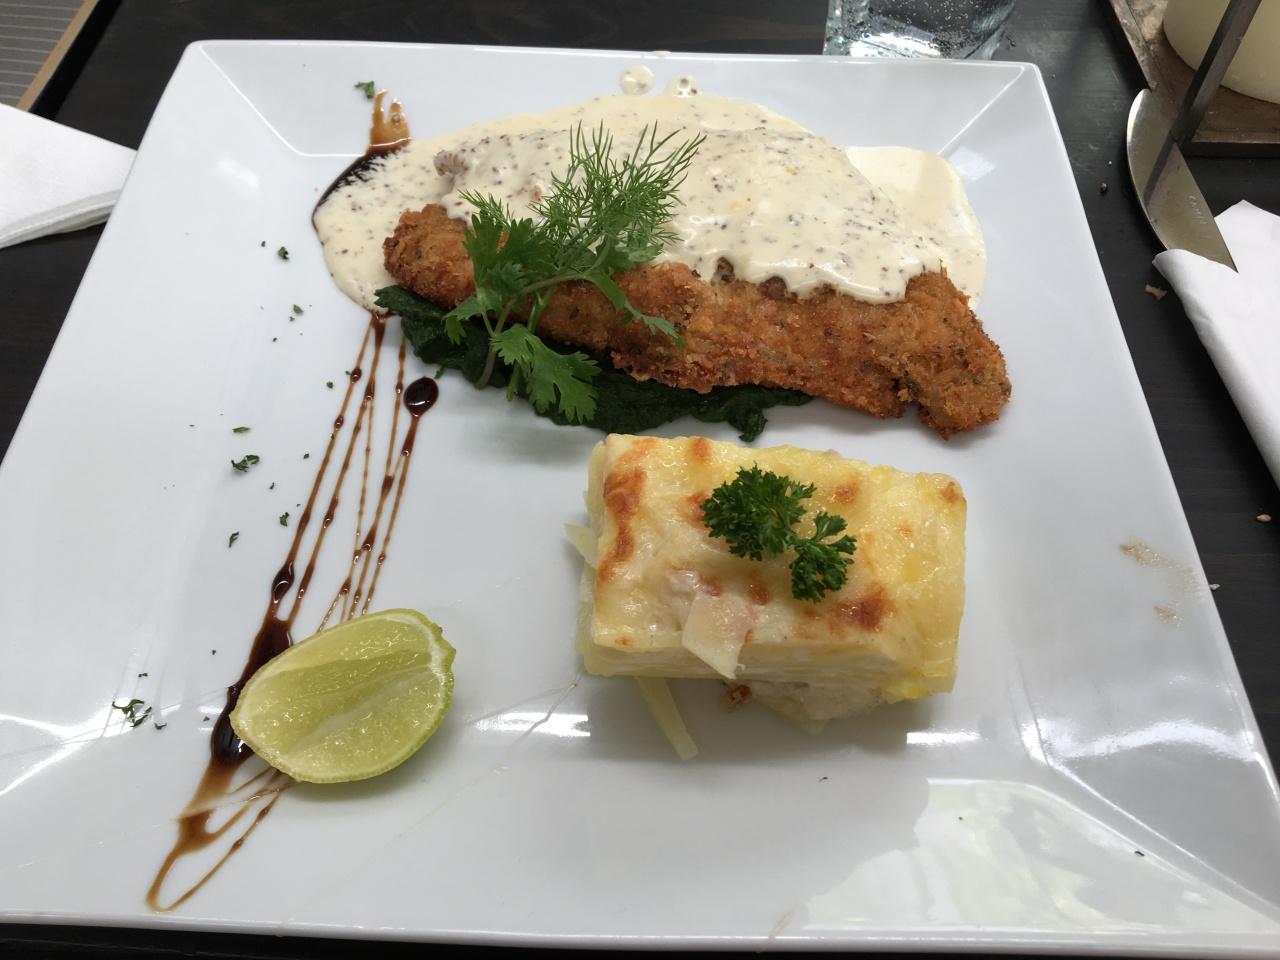 Sampling Pakistan cuisine